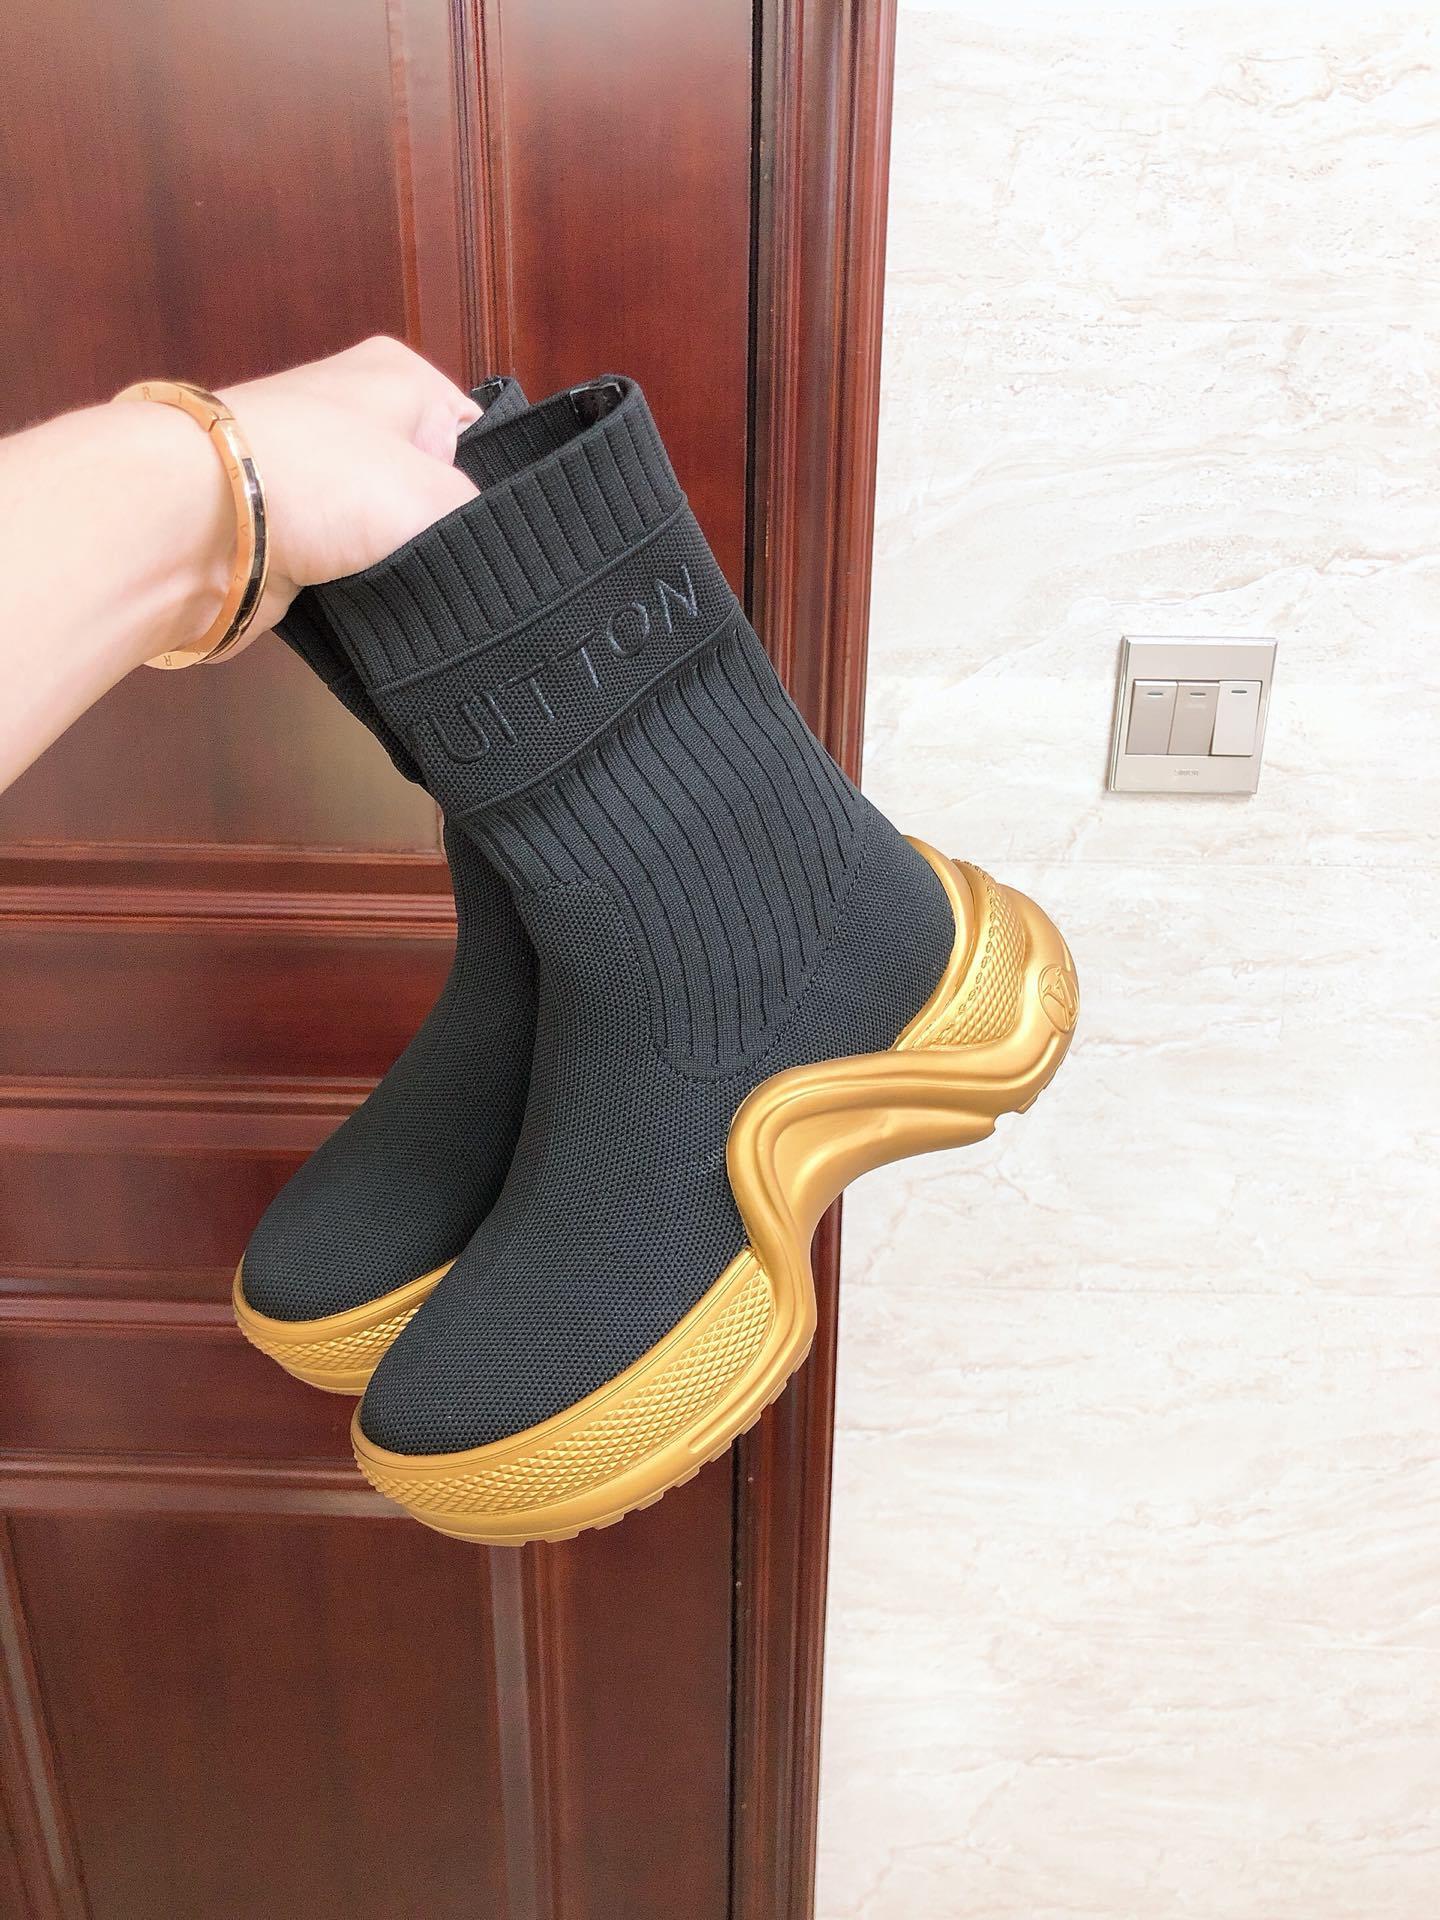 lv archlight sneaker boot 1A52LX lv women boot lv women sneaker lv shoes  10